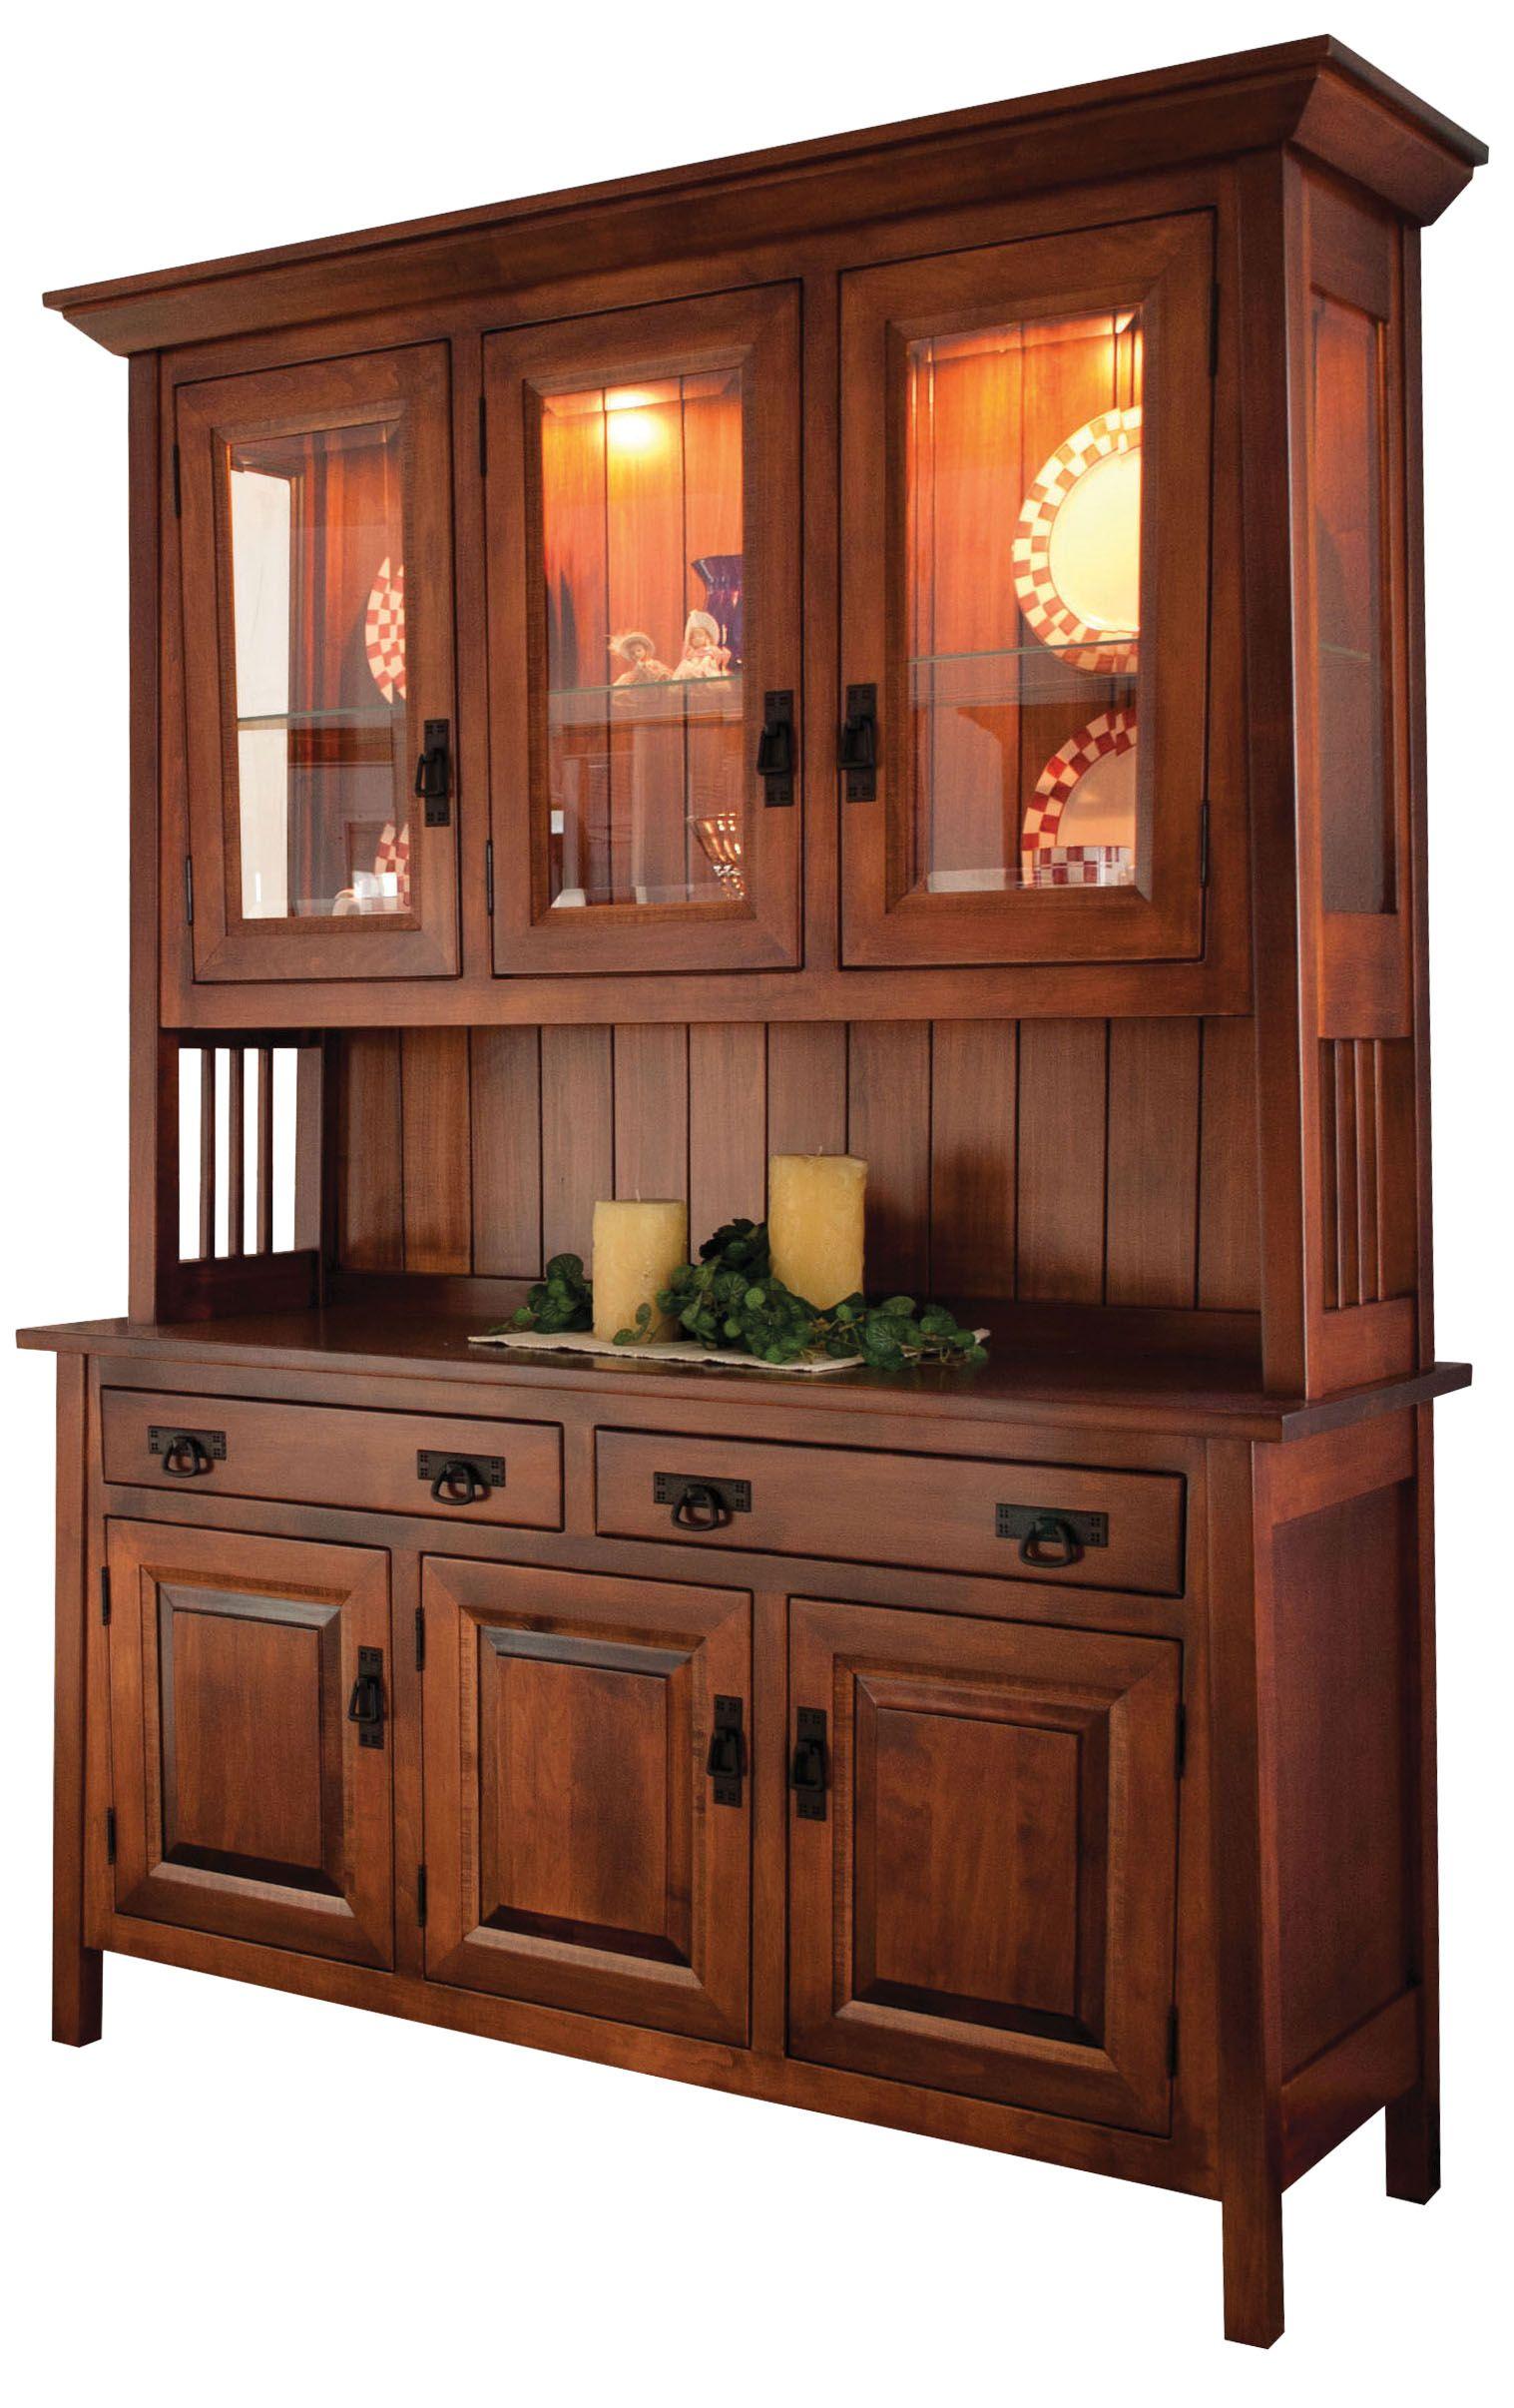 Best 3 Door Hutches Dining Room Furniture Amish Oak In 640 x 480